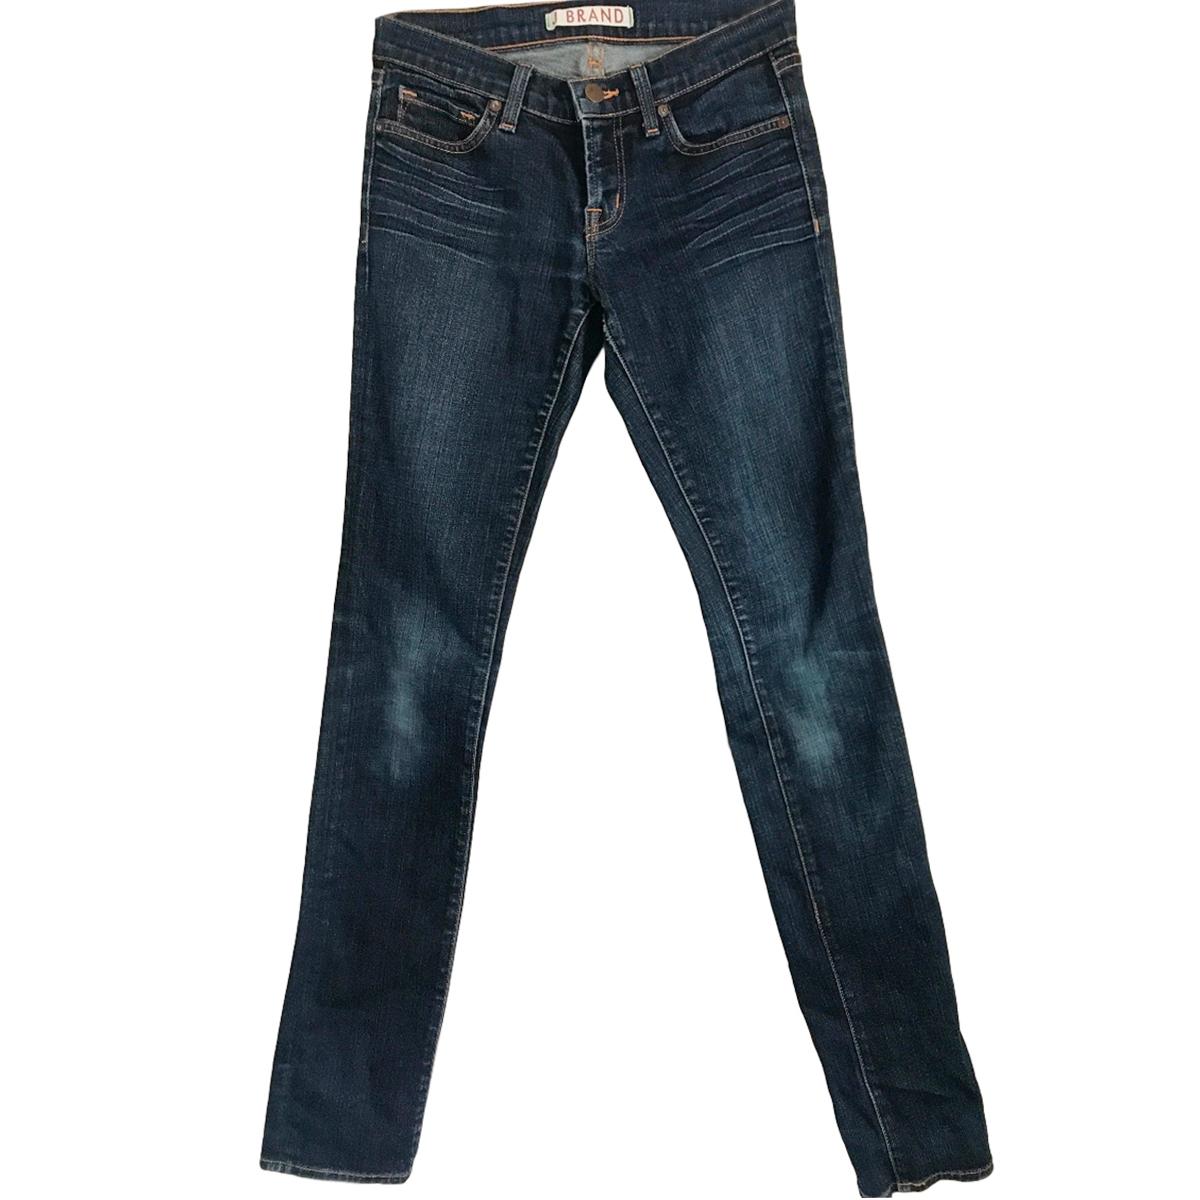 J Brand high waisted ink blue jeans